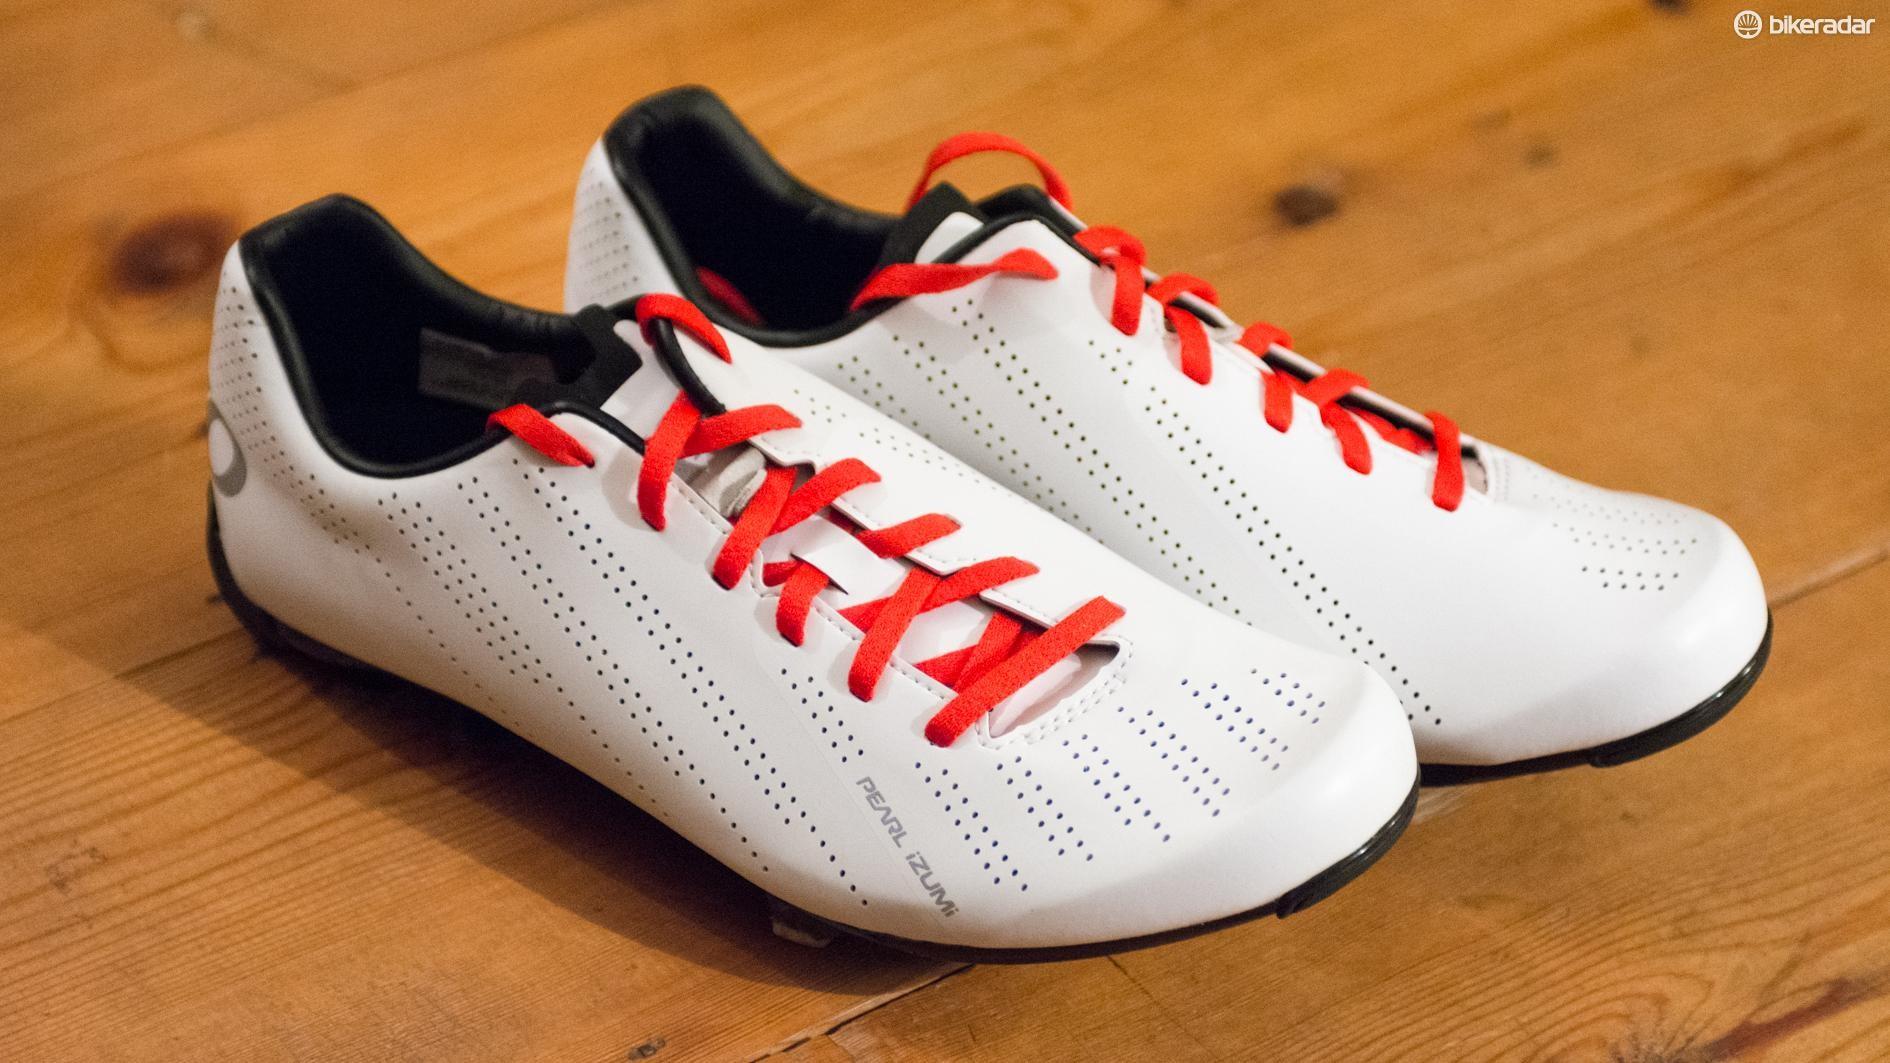 These reasonably priced kicks from Pearl Izumi look great